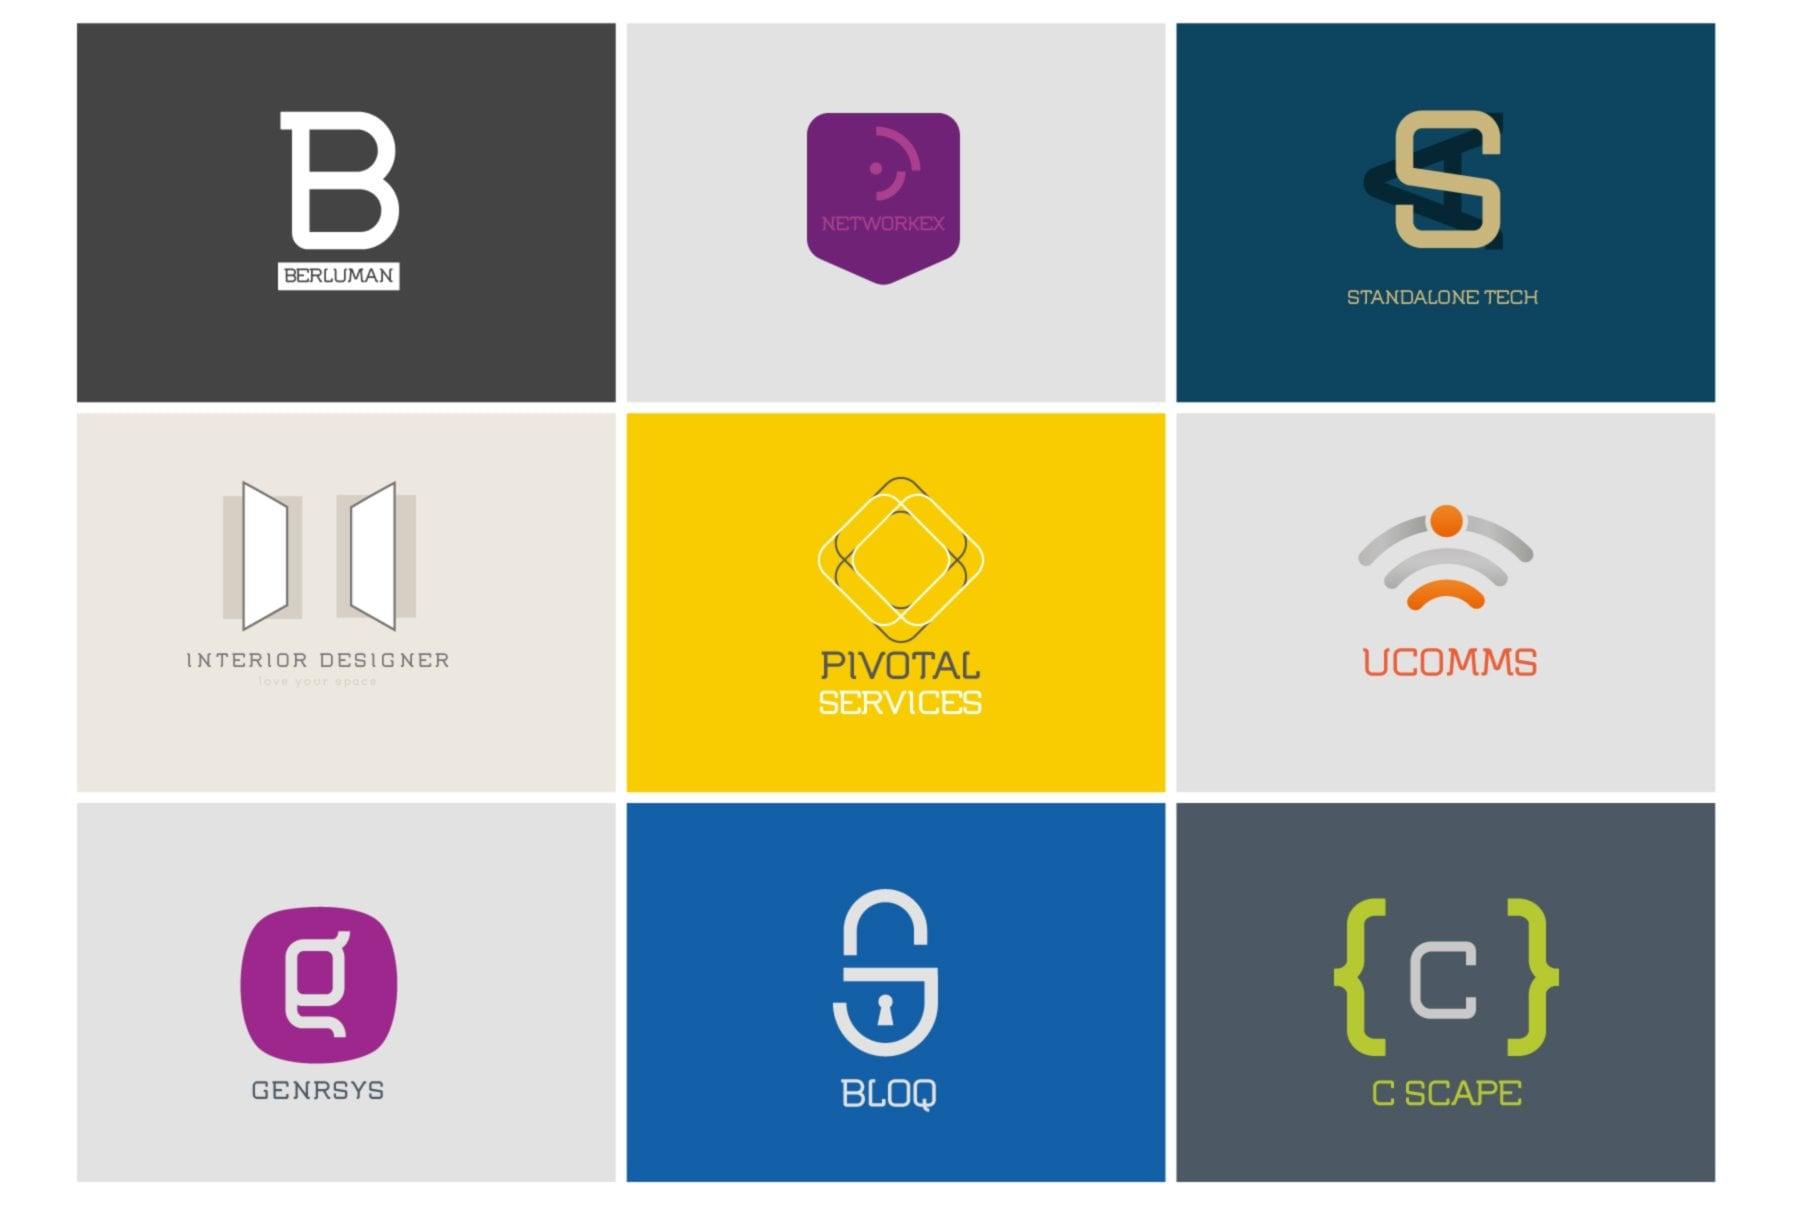 Editable Logos using Flumen Digital Corporate Designs